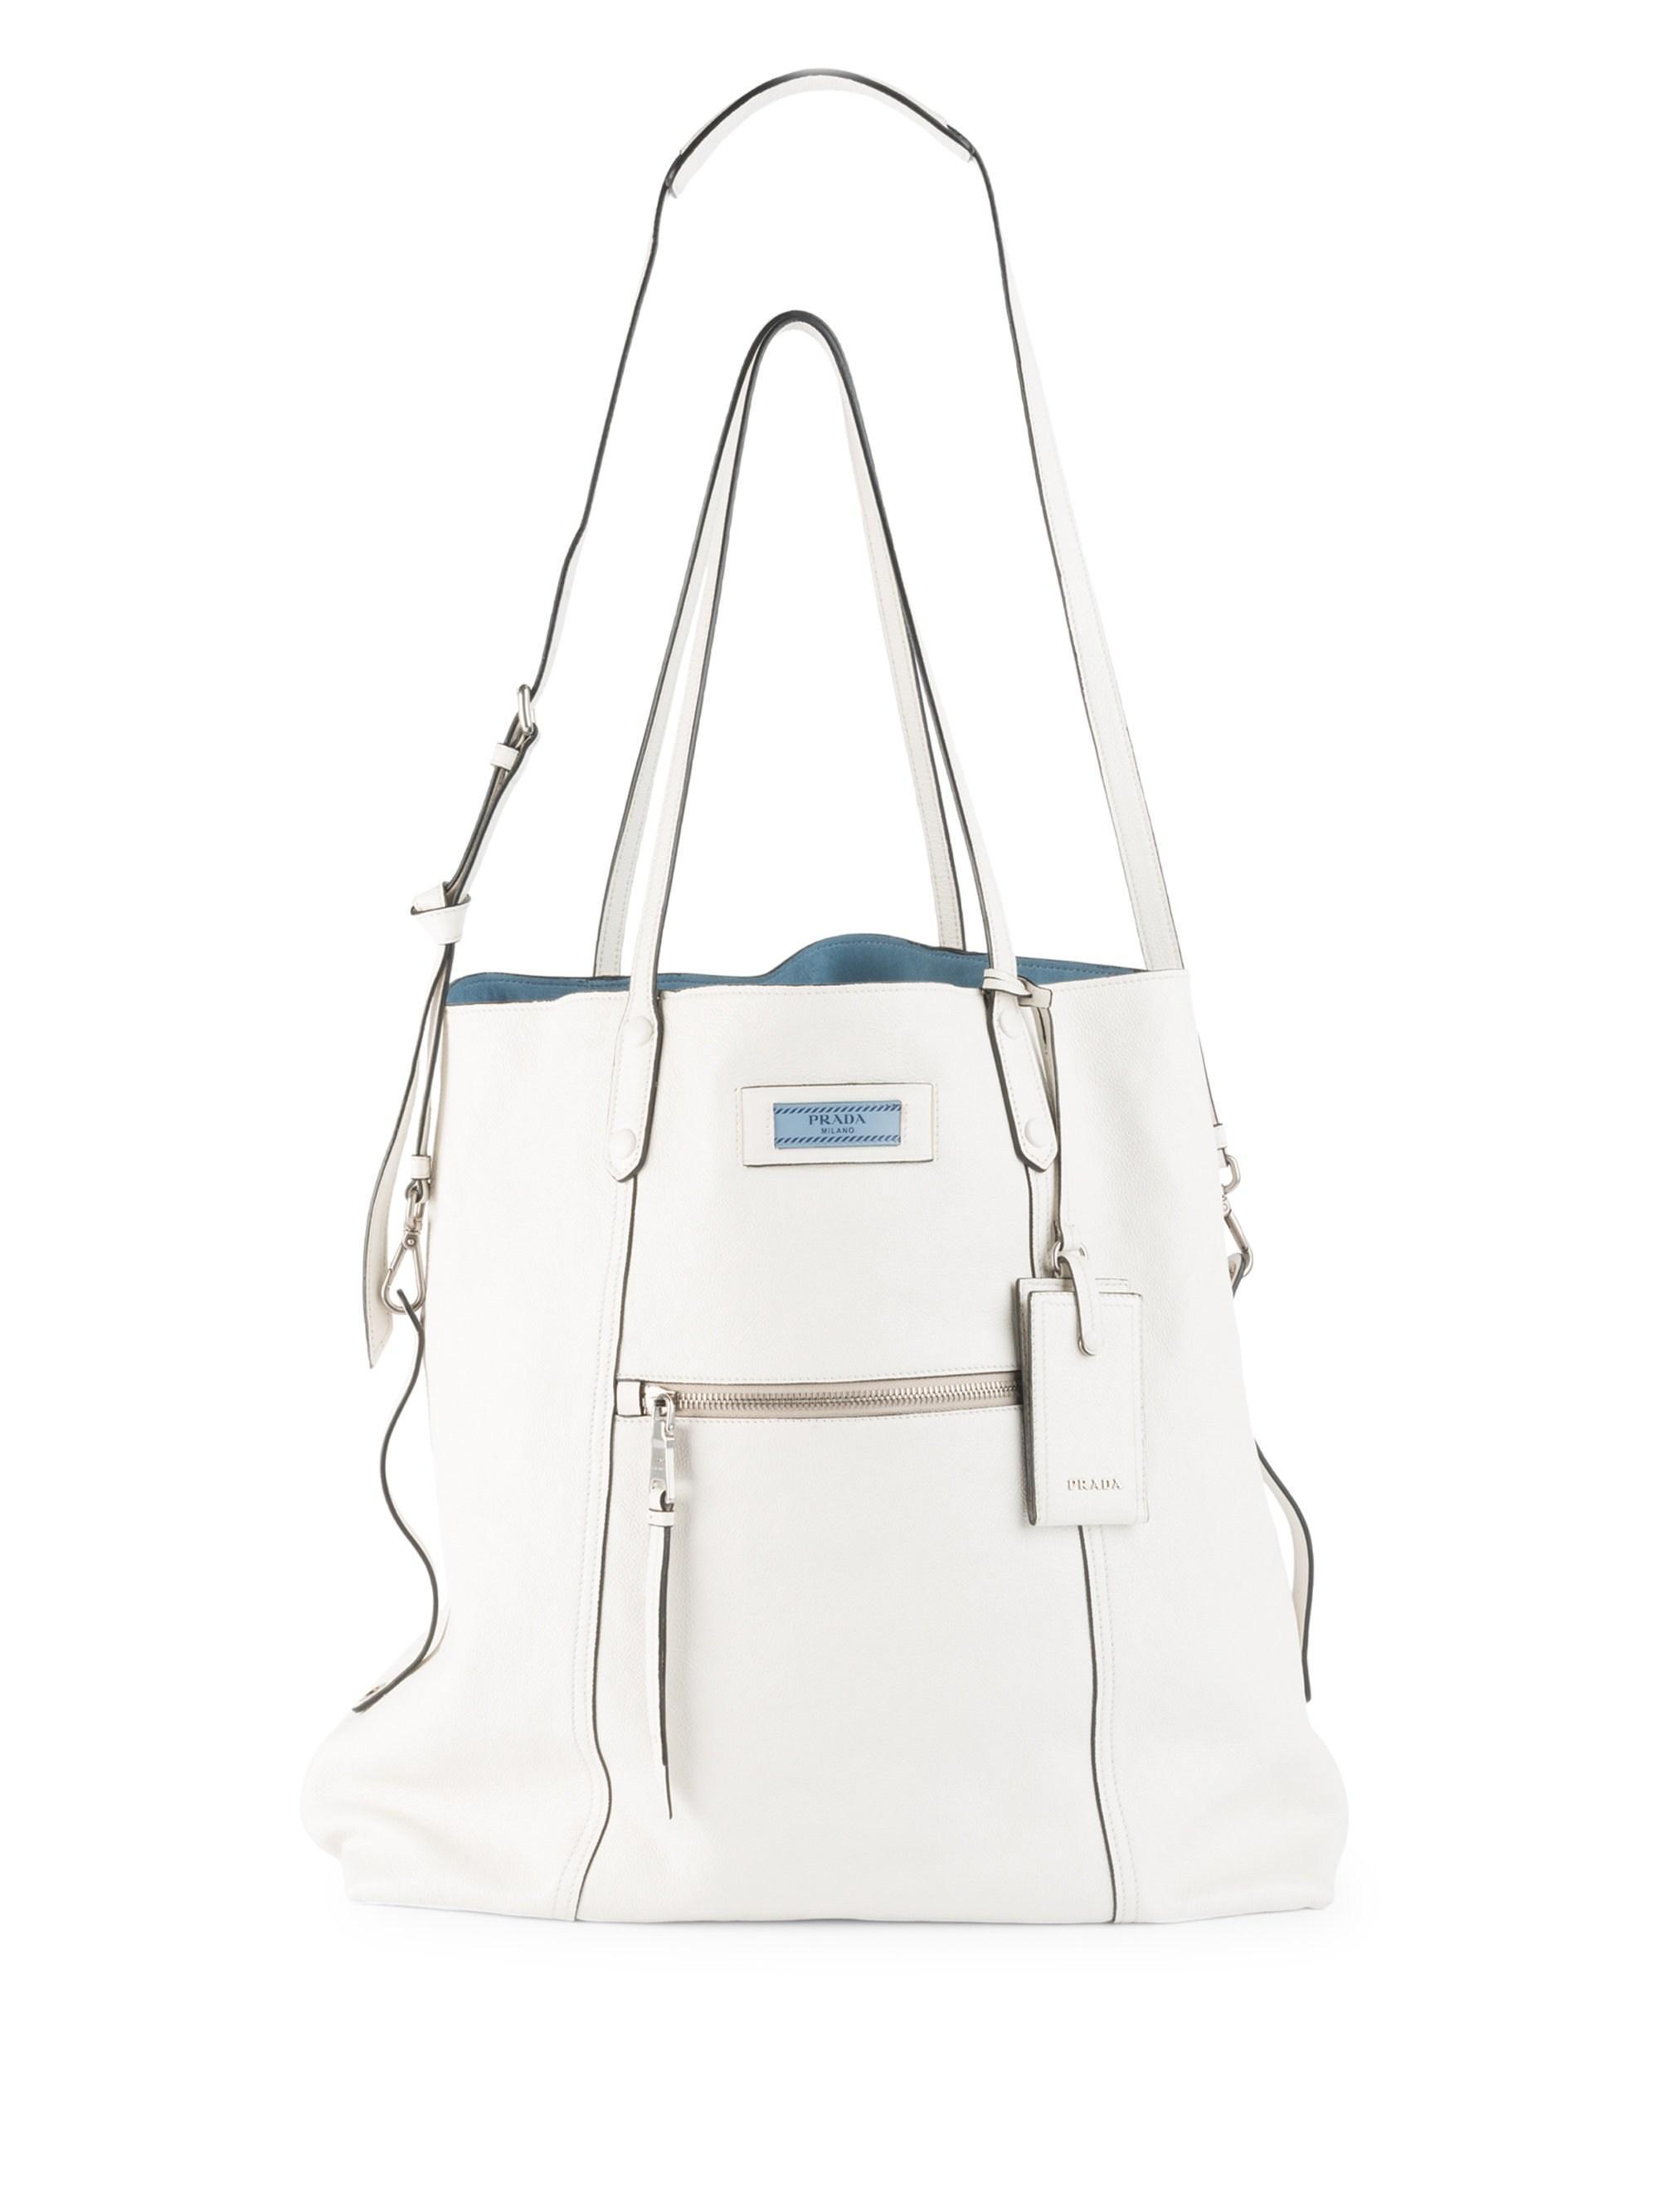 95976fcfb3c085 Lyst - Prada Glace Etiquette Leather Shoulder Bag in White